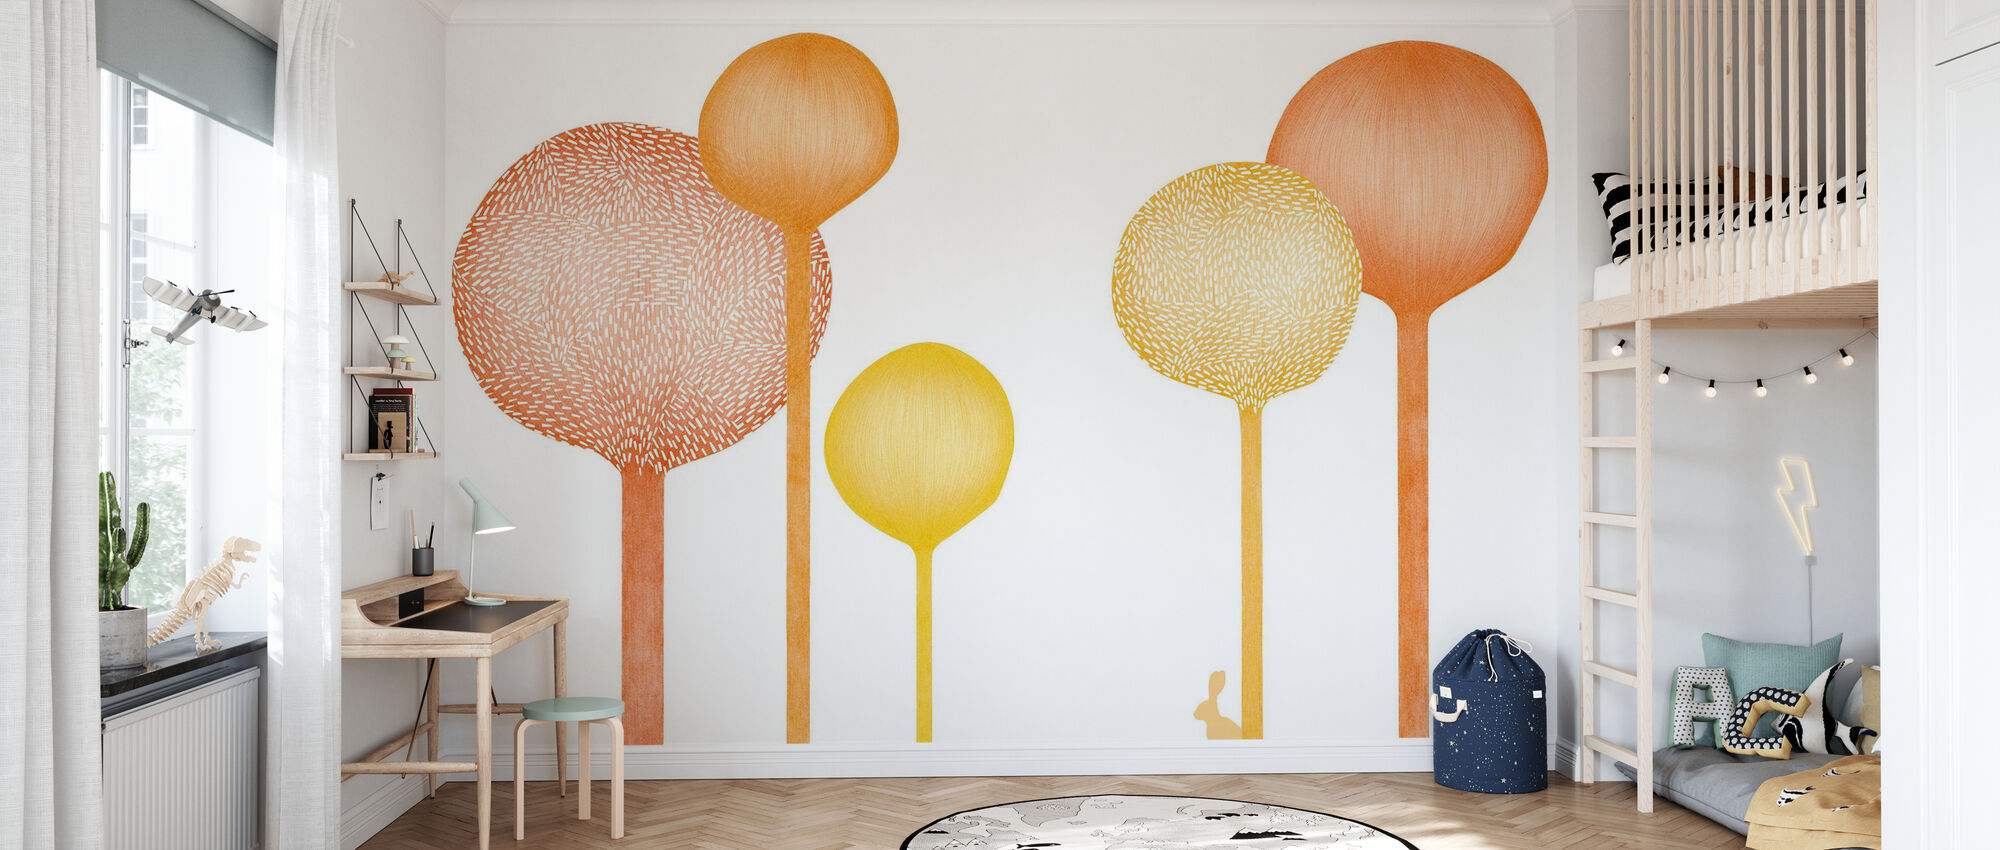 Studio Rita | Elin Öhrling - Boslandschap - Oranje - Behang - Kinderkamer